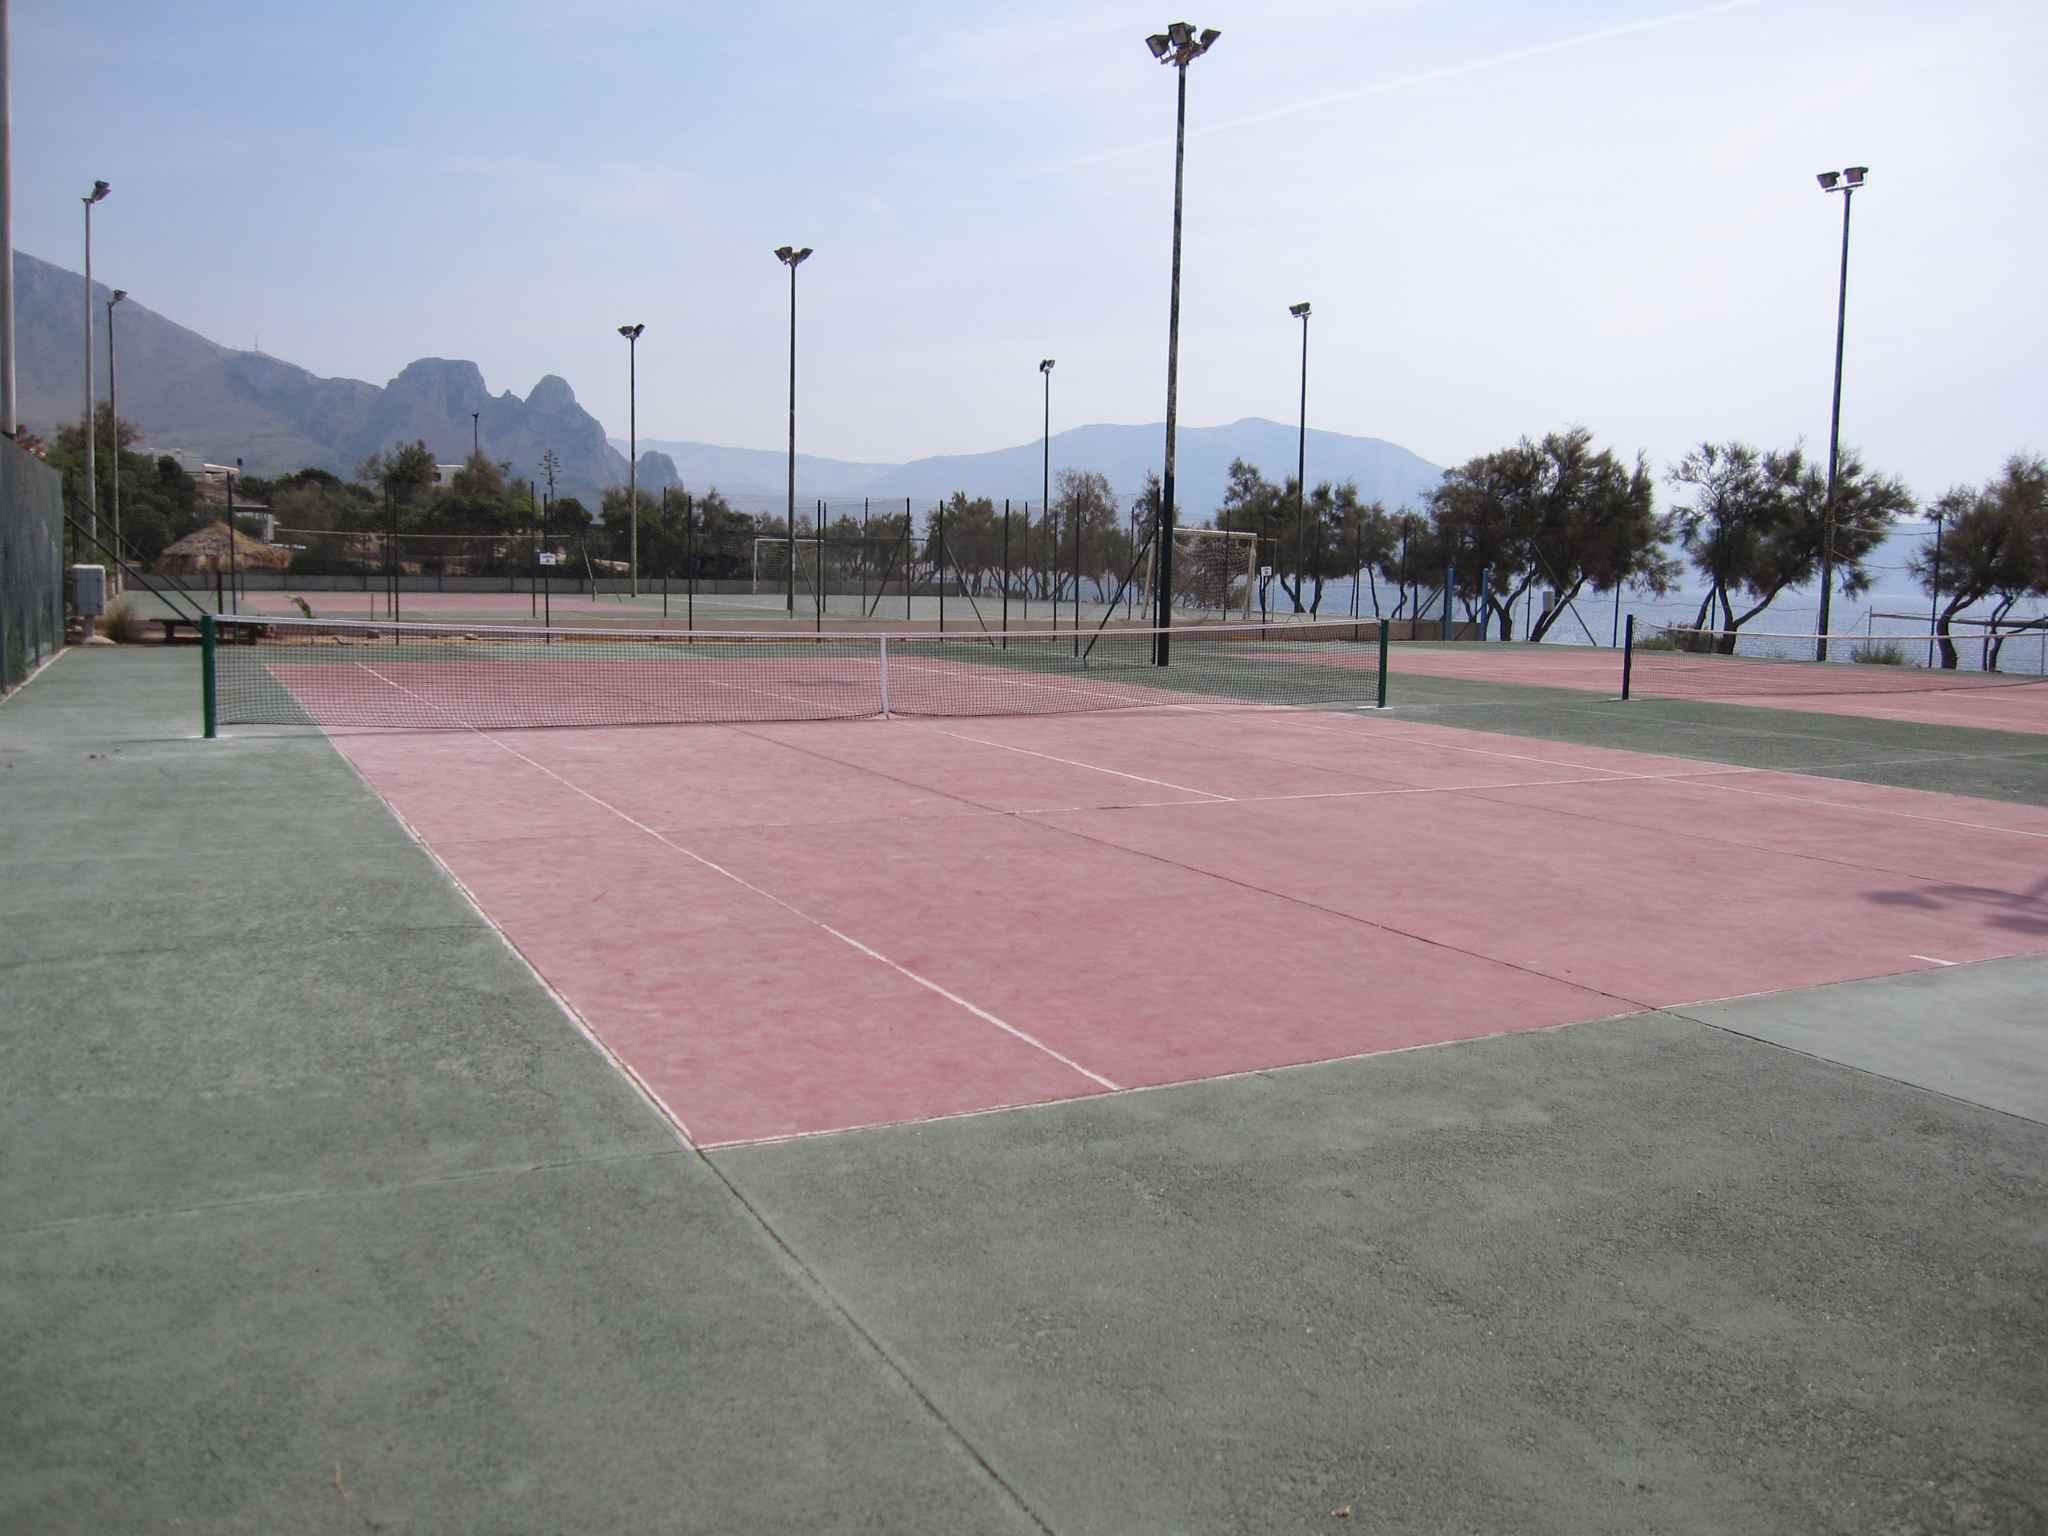 Appartement de vacances Mobilehome mit Tischtennis und Fahrradverleih (2483443), San Vito Lo Capo, Trapani, Sicile, Italie, image 9